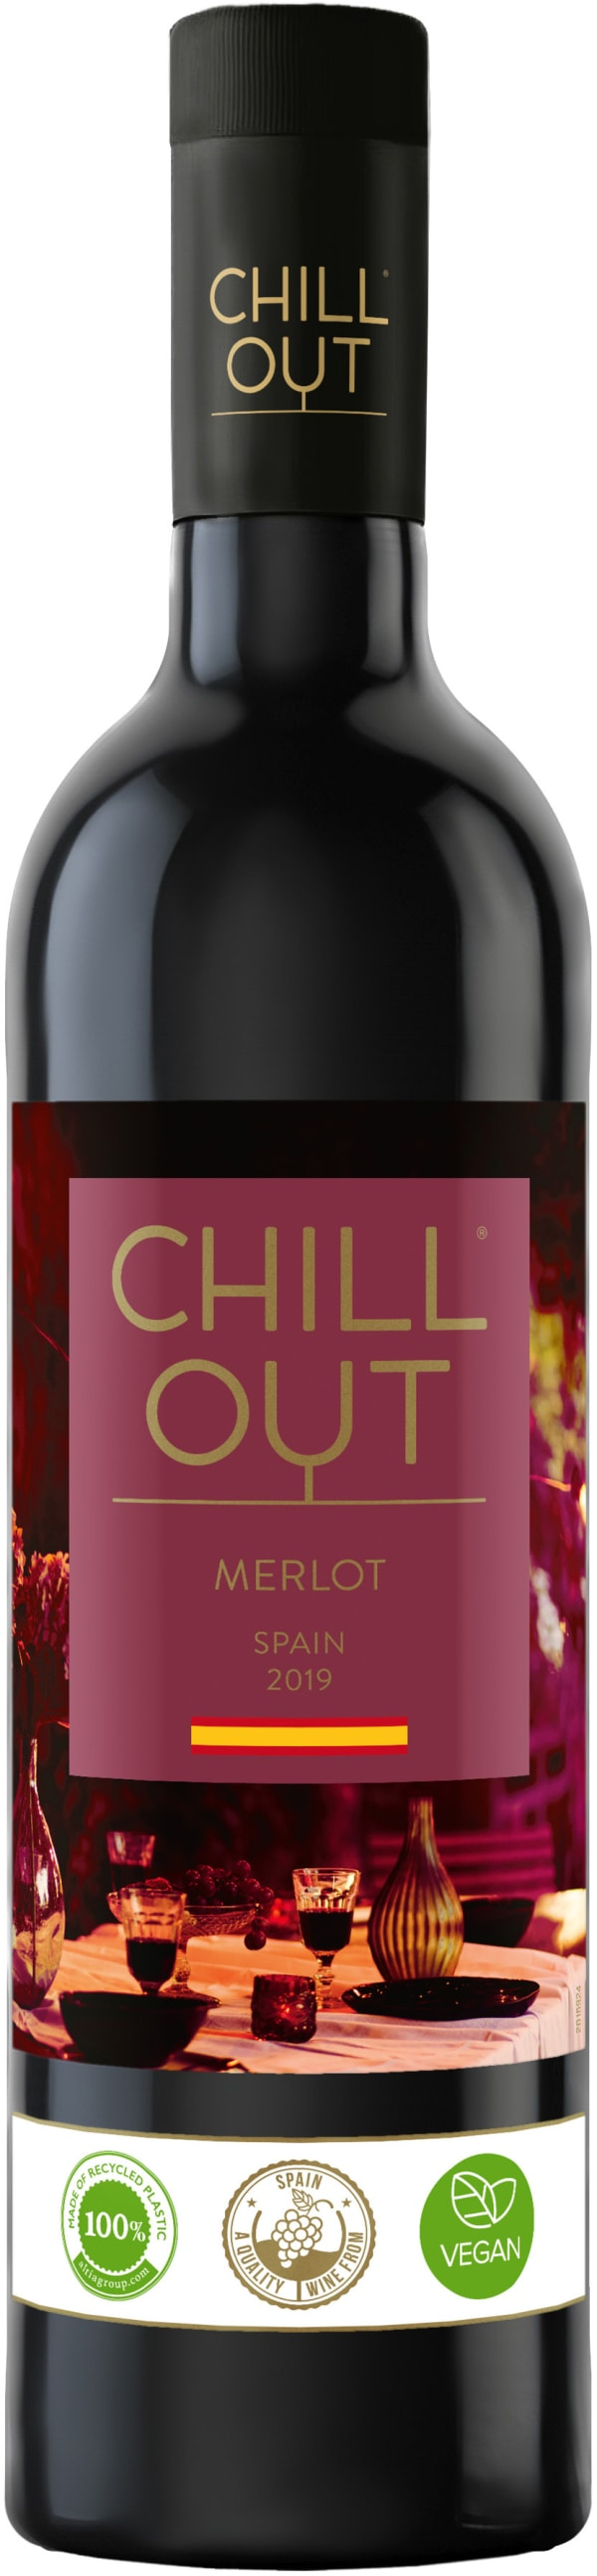 Chill Out Merlot Spain  2019 plastflaska